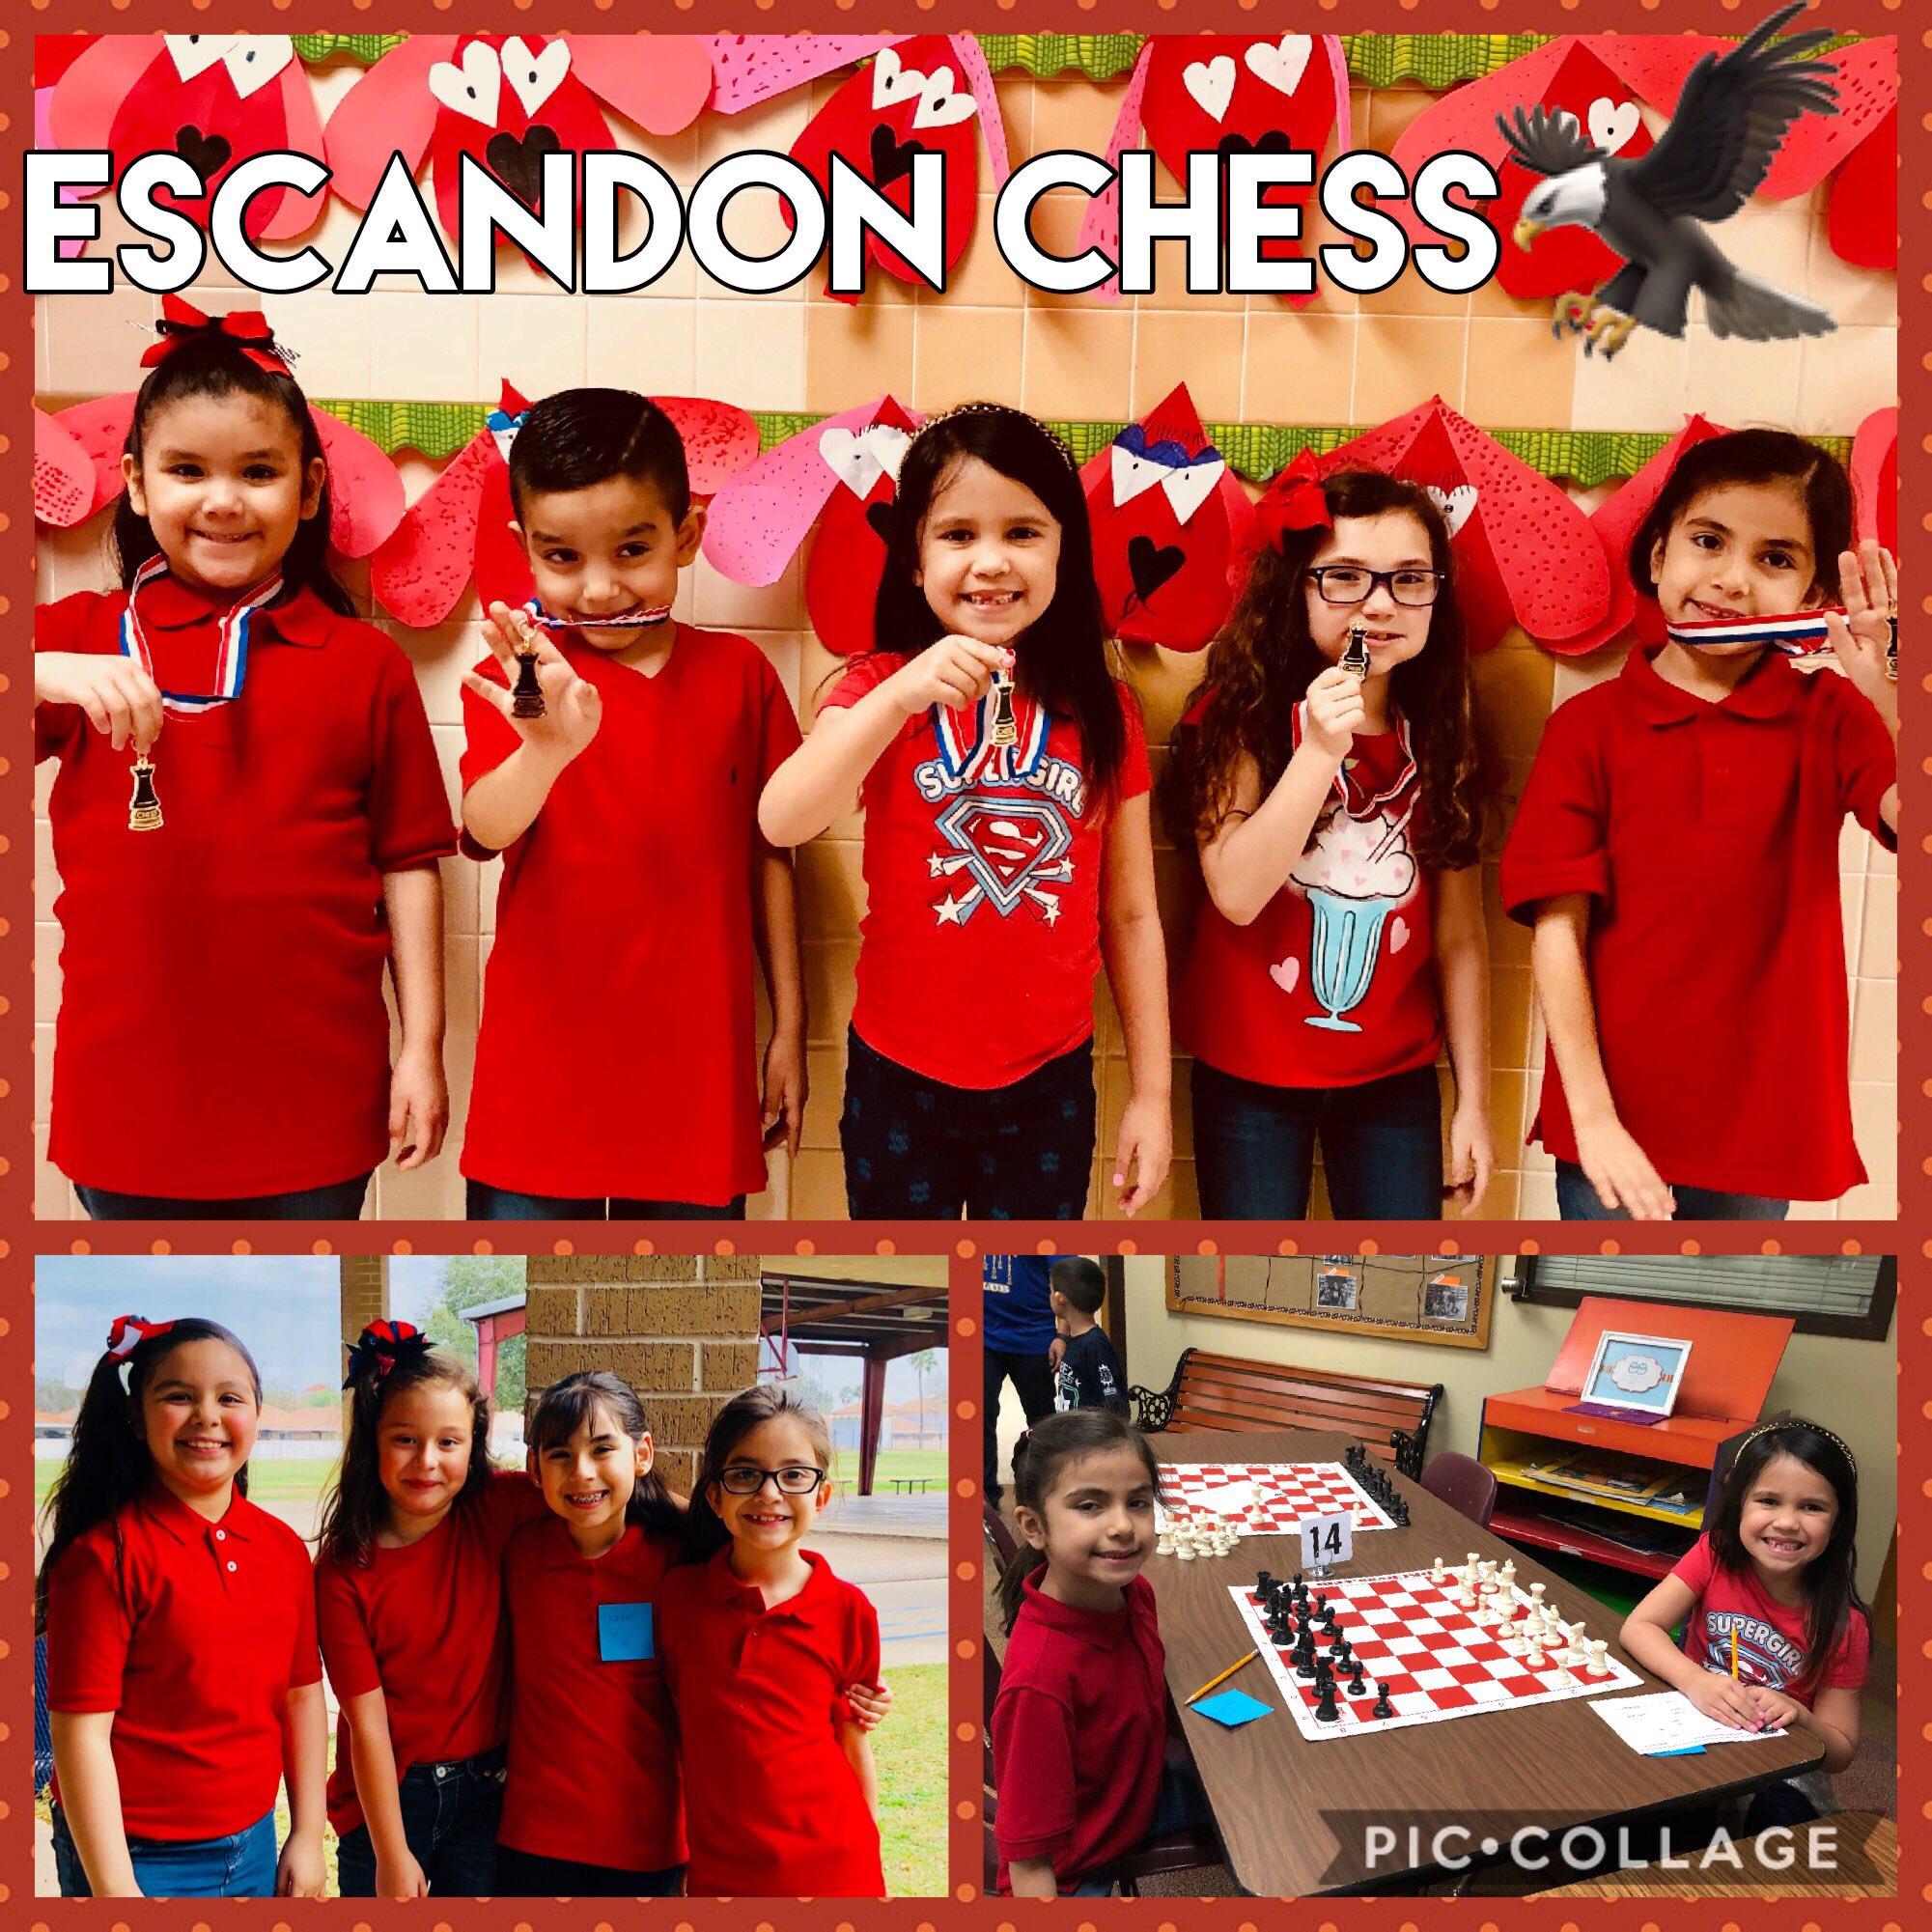 escandon elementary on twitter congratulations to our escandon